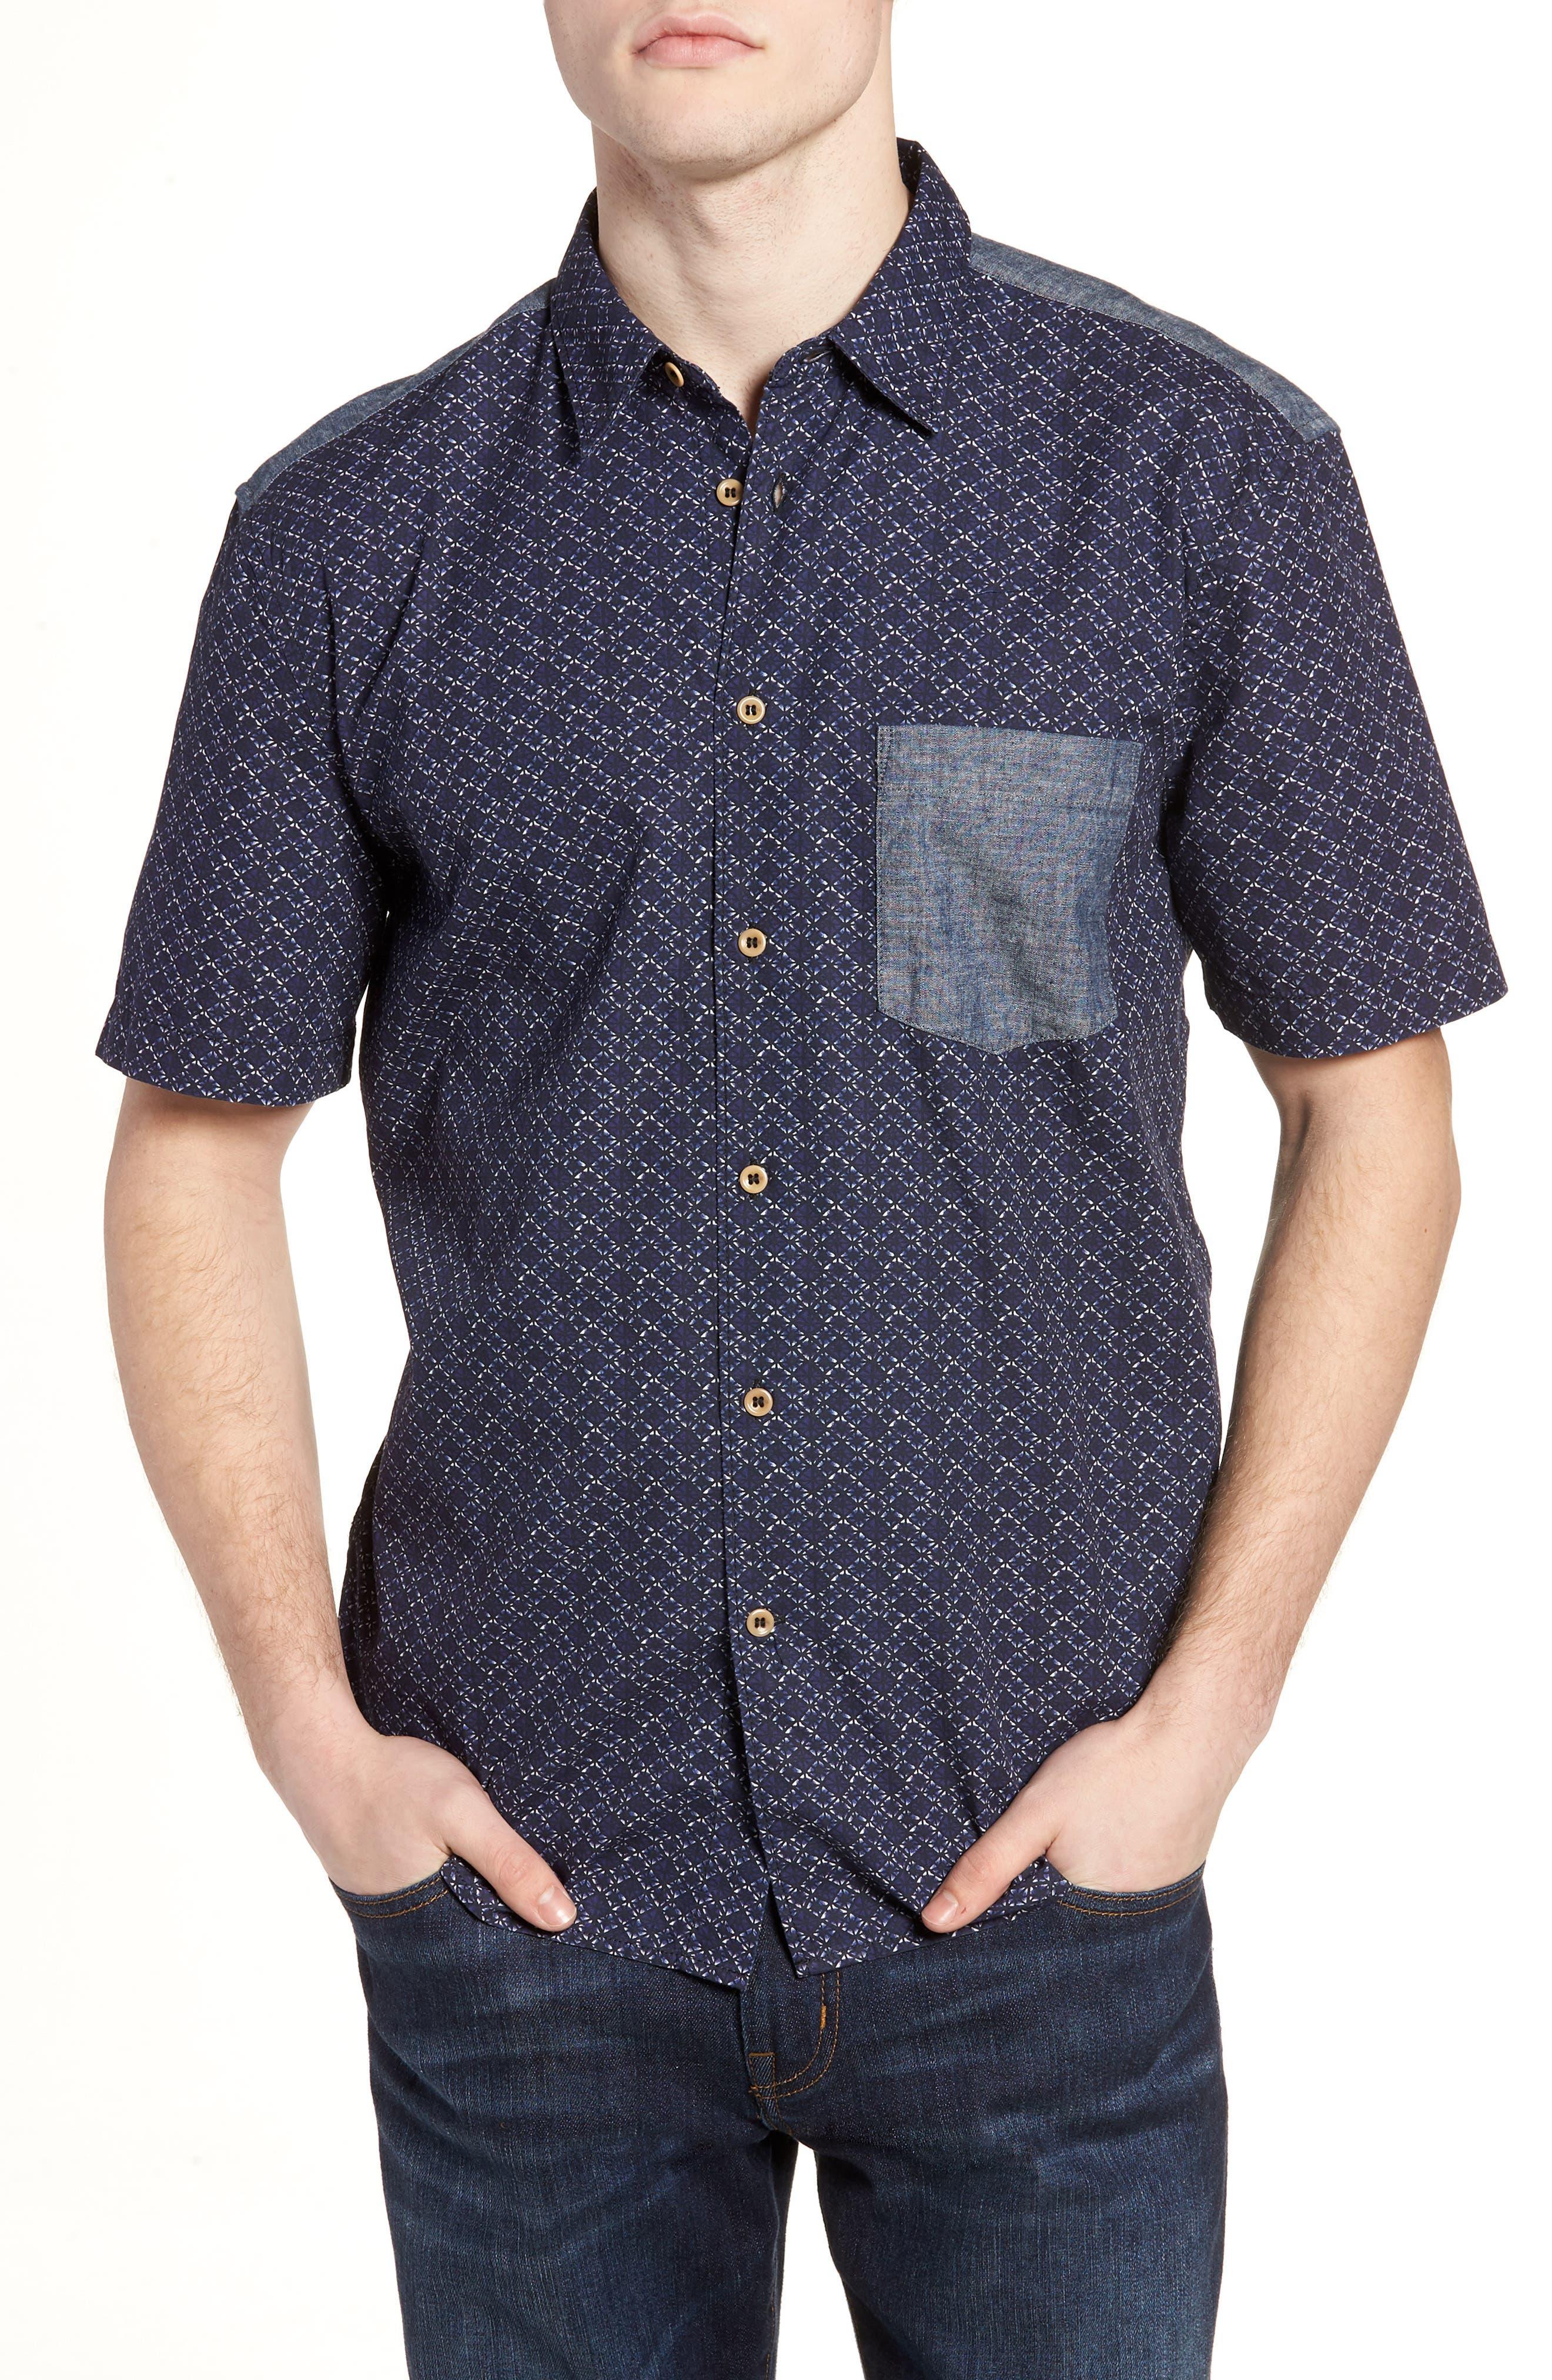 Kast Relaxed Fit Short Sleeve Sport Shirt,                             Main thumbnail 1, color,                             Deep Cobalt